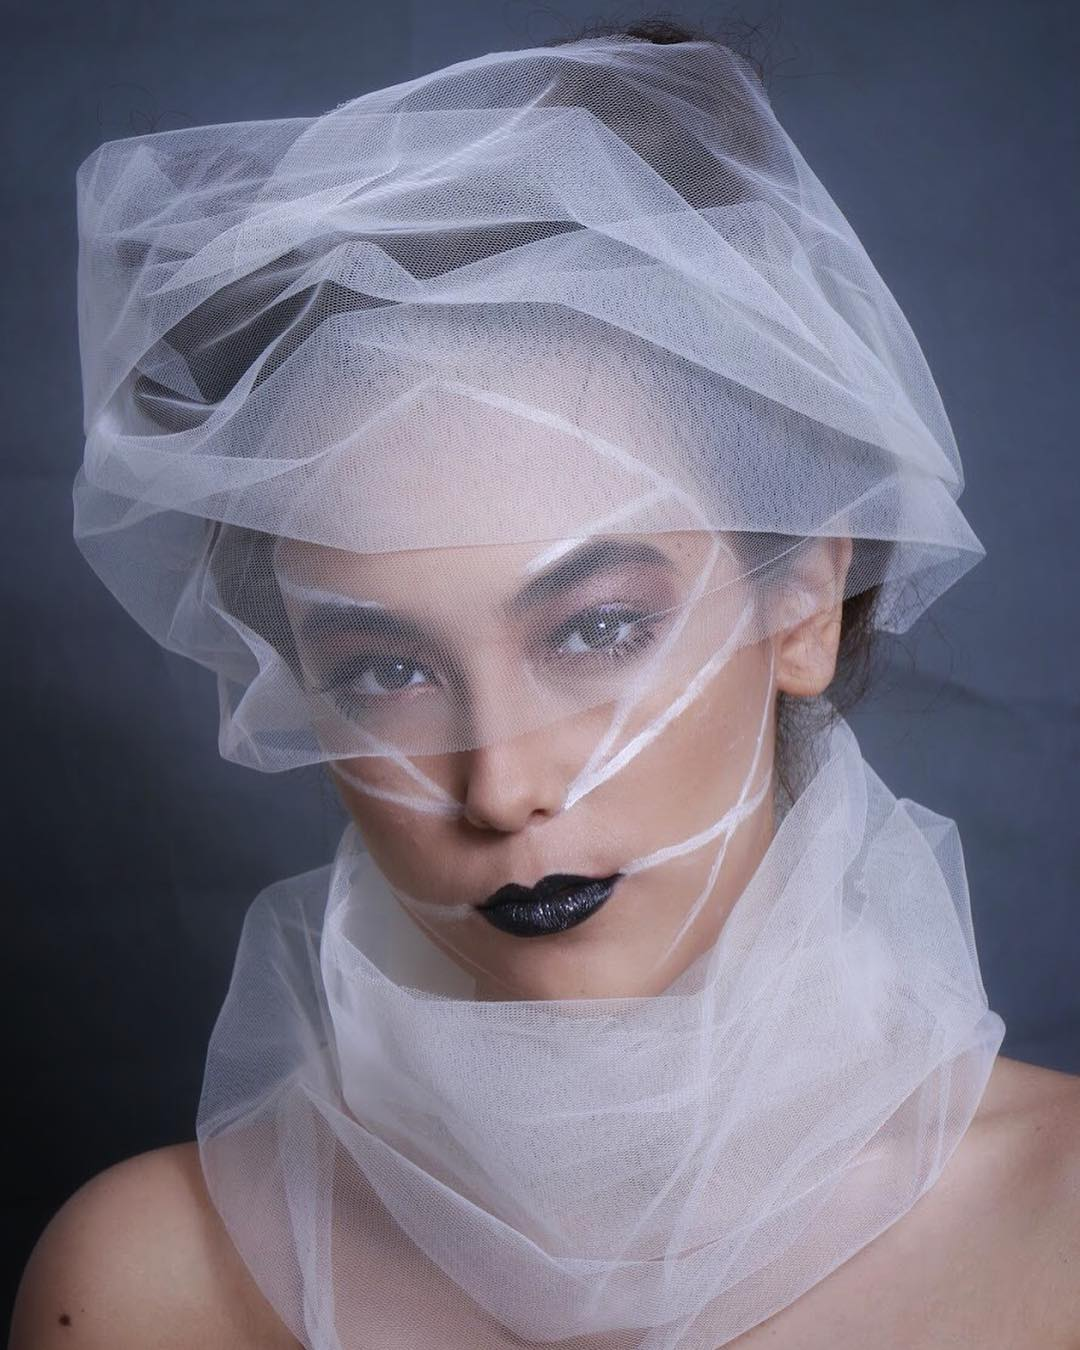 10 Potret Sonia Alyssa, 'Gebetan' Ikbal Fauzi di Sinetron Ikatan Cinta